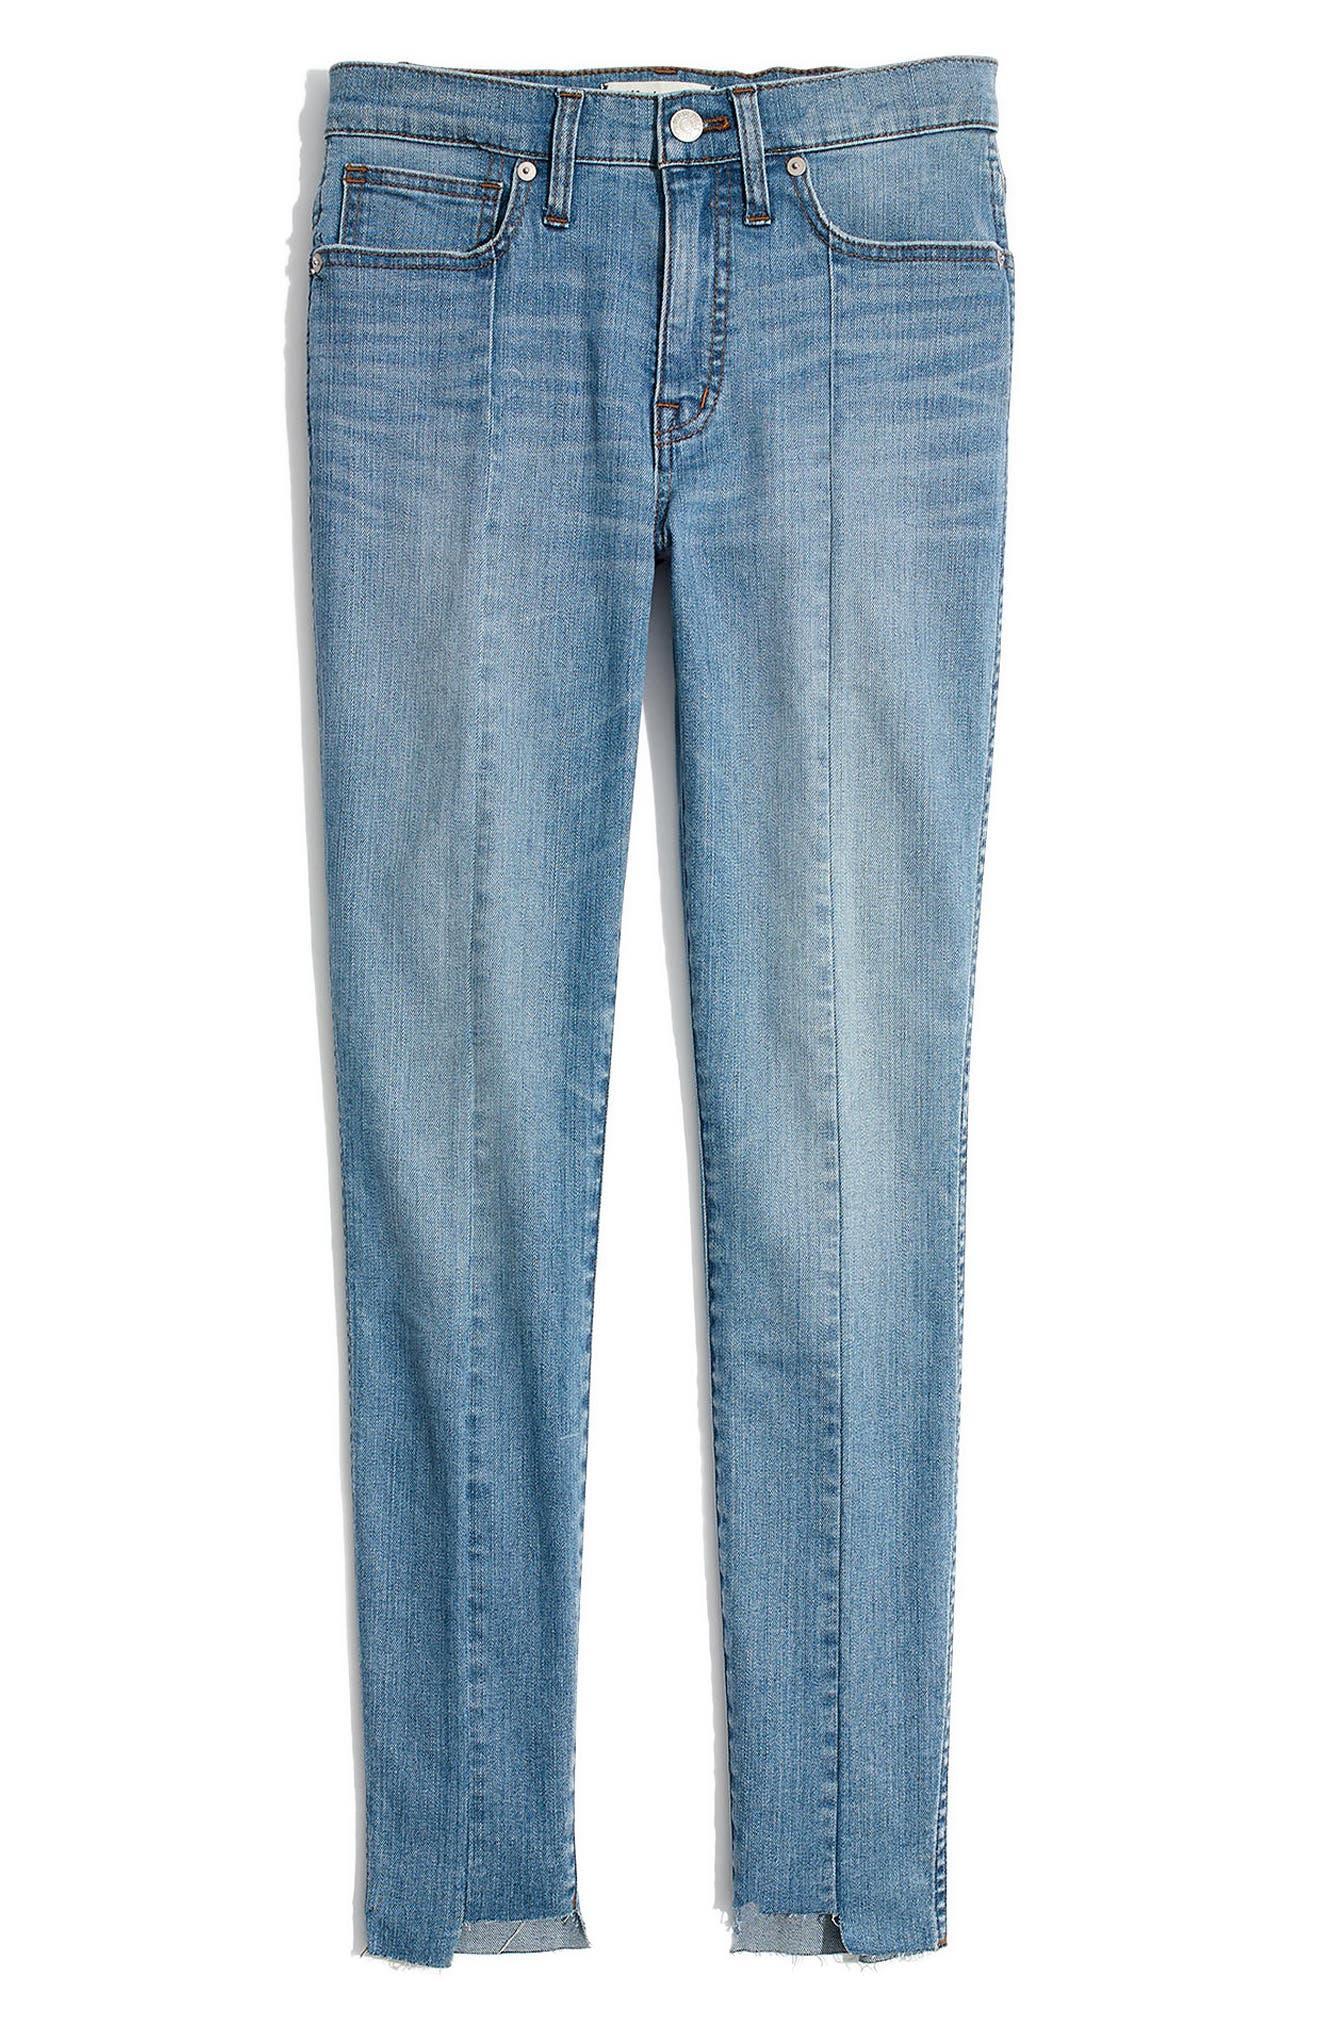 9-Inch High Waist Seamed Step-Hem Edition Skinny Jeans,                             Alternate thumbnail 6, color,                             August